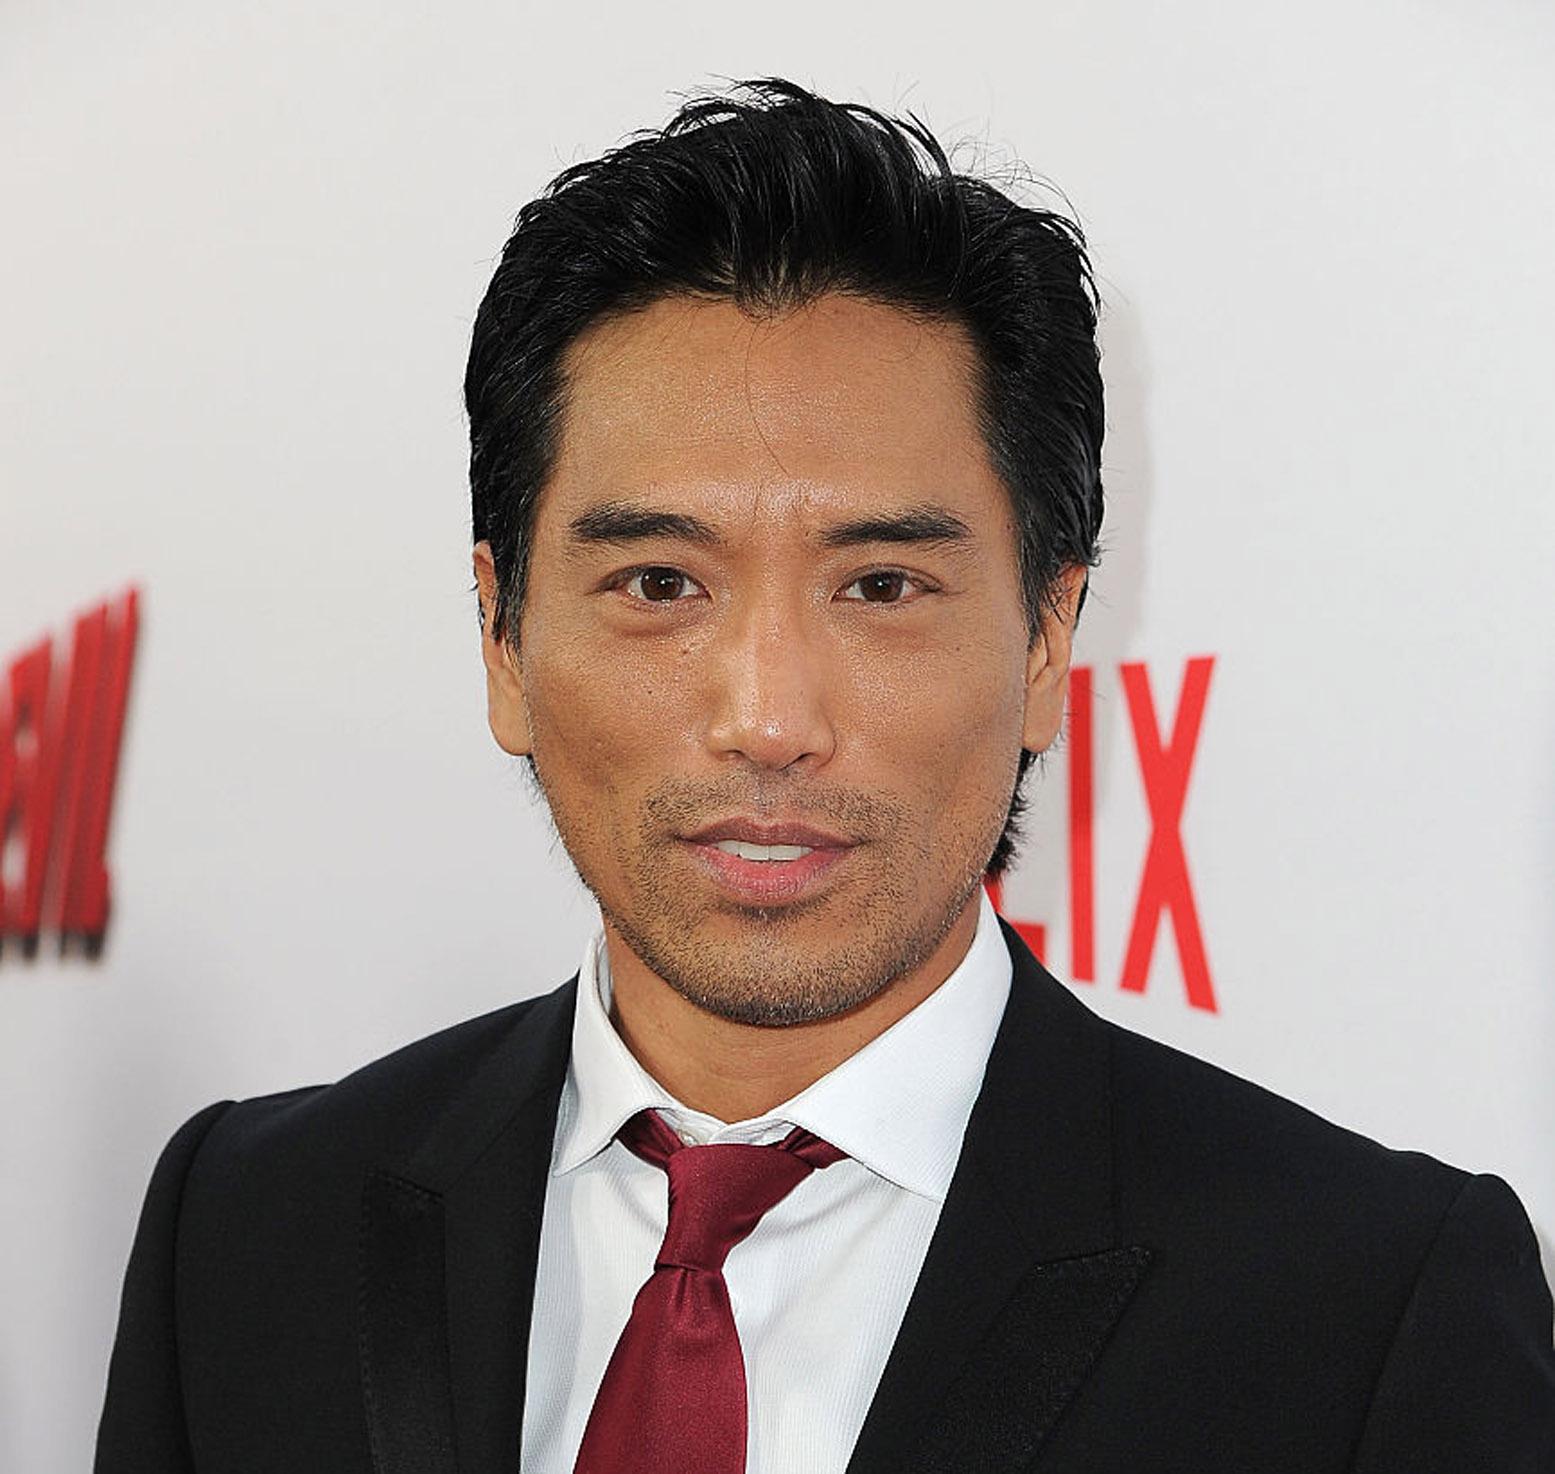 Peter Shinkoda på premieren til Netflix' Marvel-serie Daredevil i Los Angeles i 2015 (Angela Weiss/Getty)